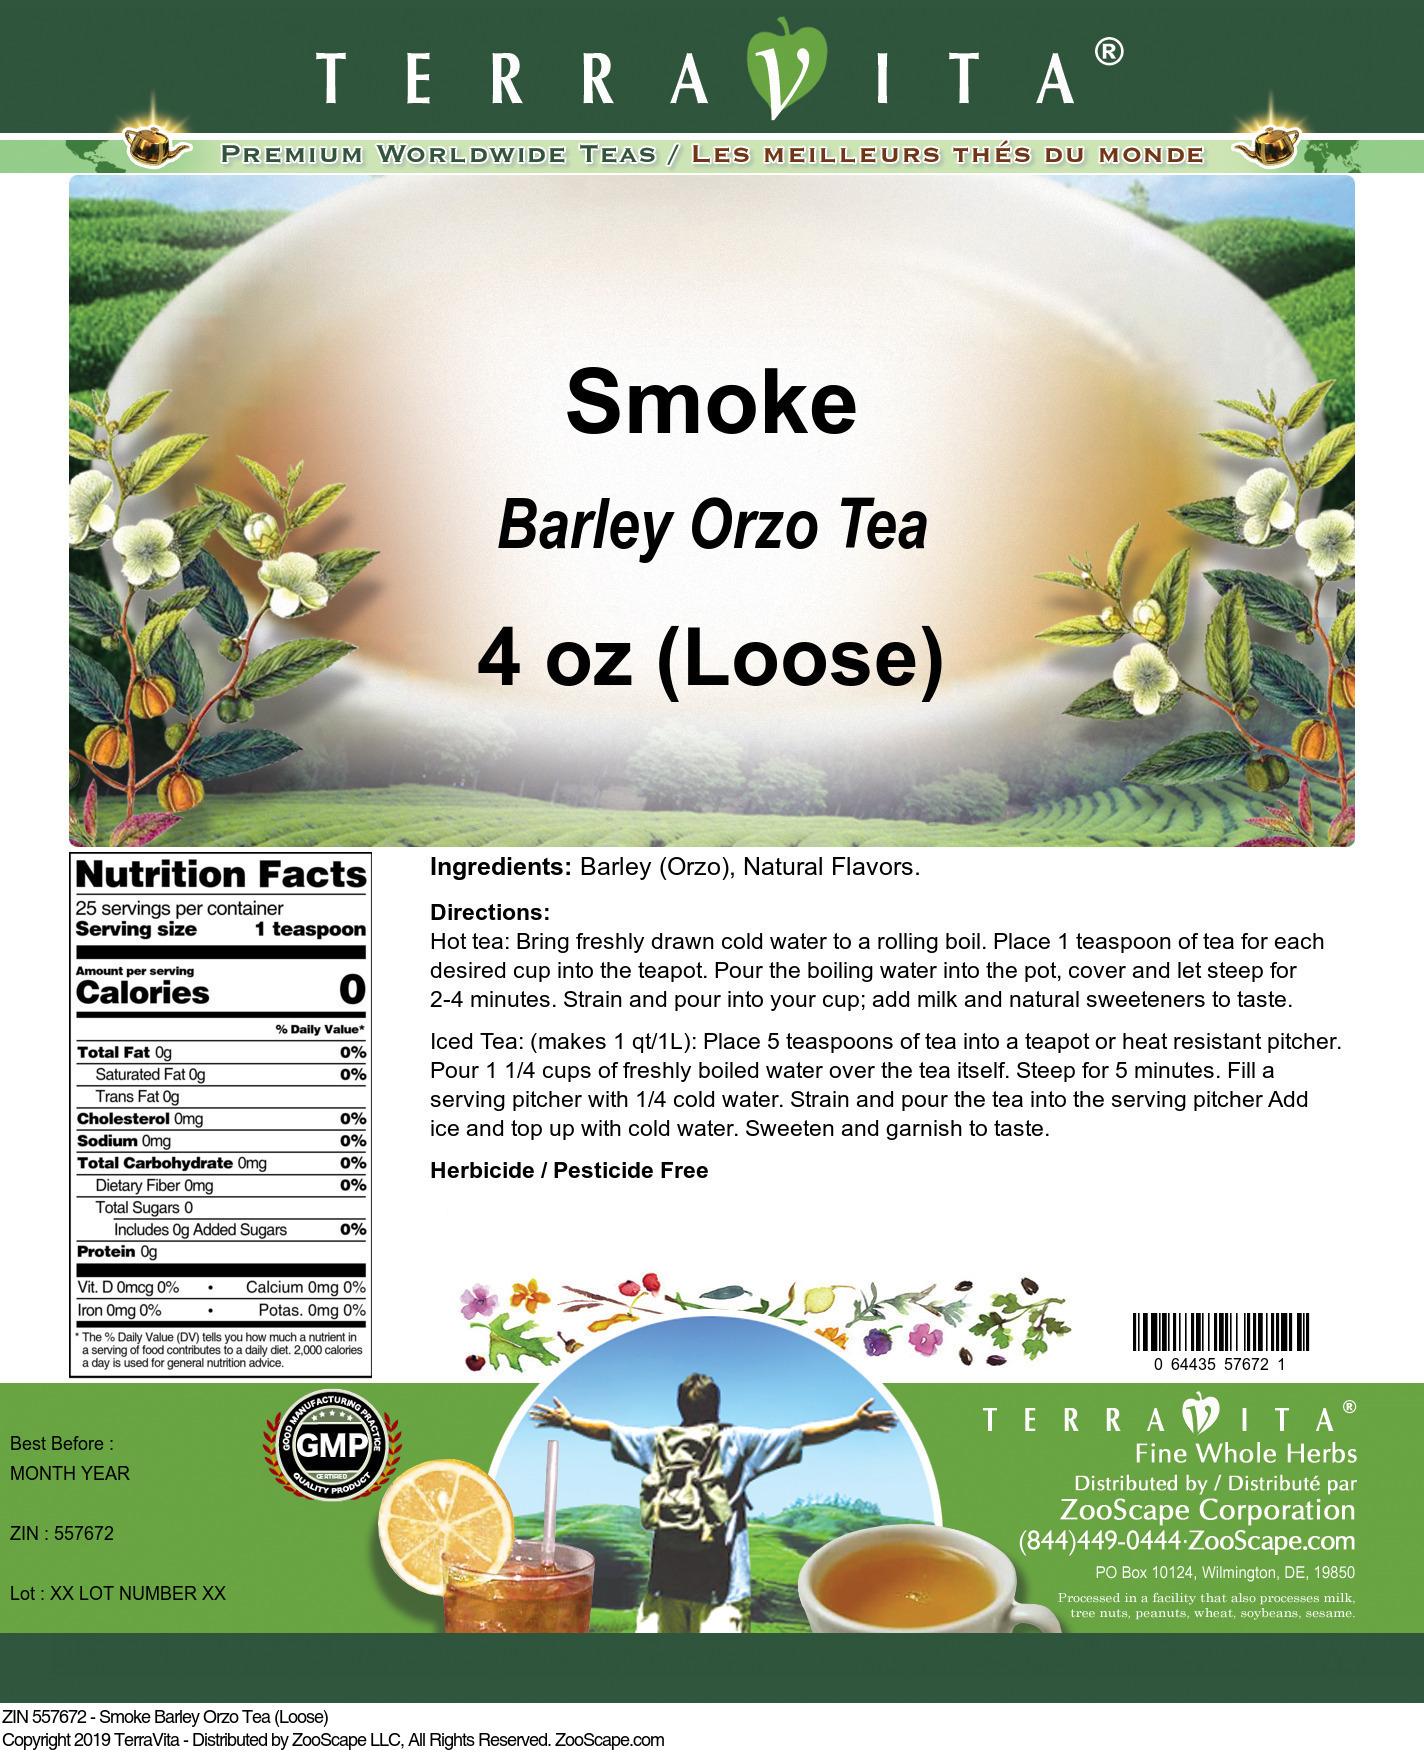 Smoke Barley Orzo